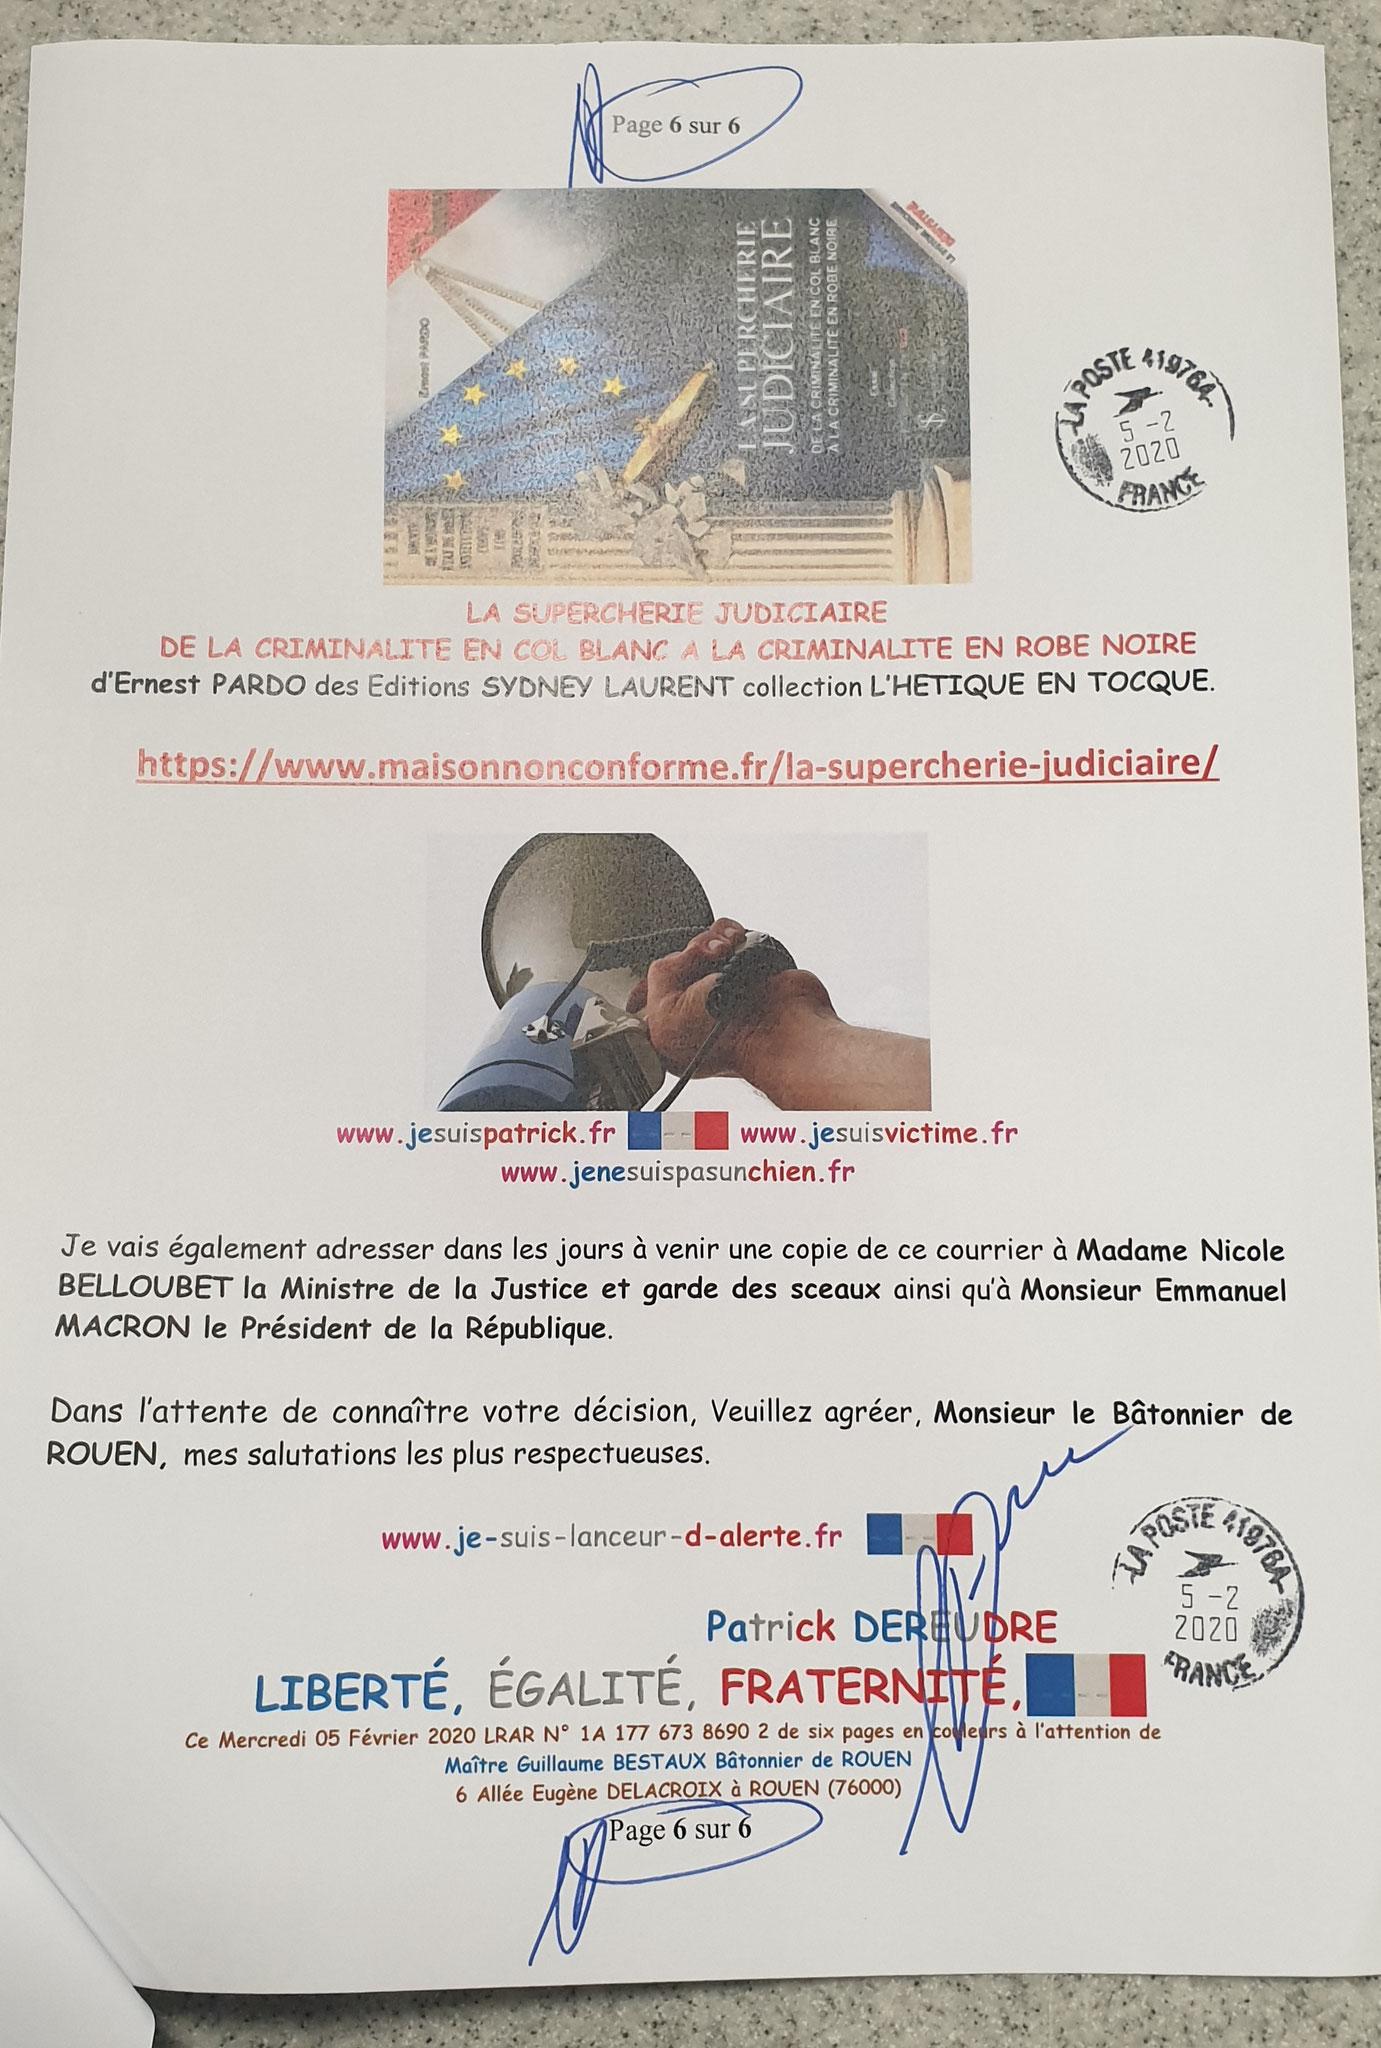 Ma lettre recommandée du 05 Février 2020 N° 1A 177 673 8690 2 Page 6 sur 6 en couleurs www.jesuispatrick.fr www.jesuisvictime.fr www.alerte-rouge-france.fr